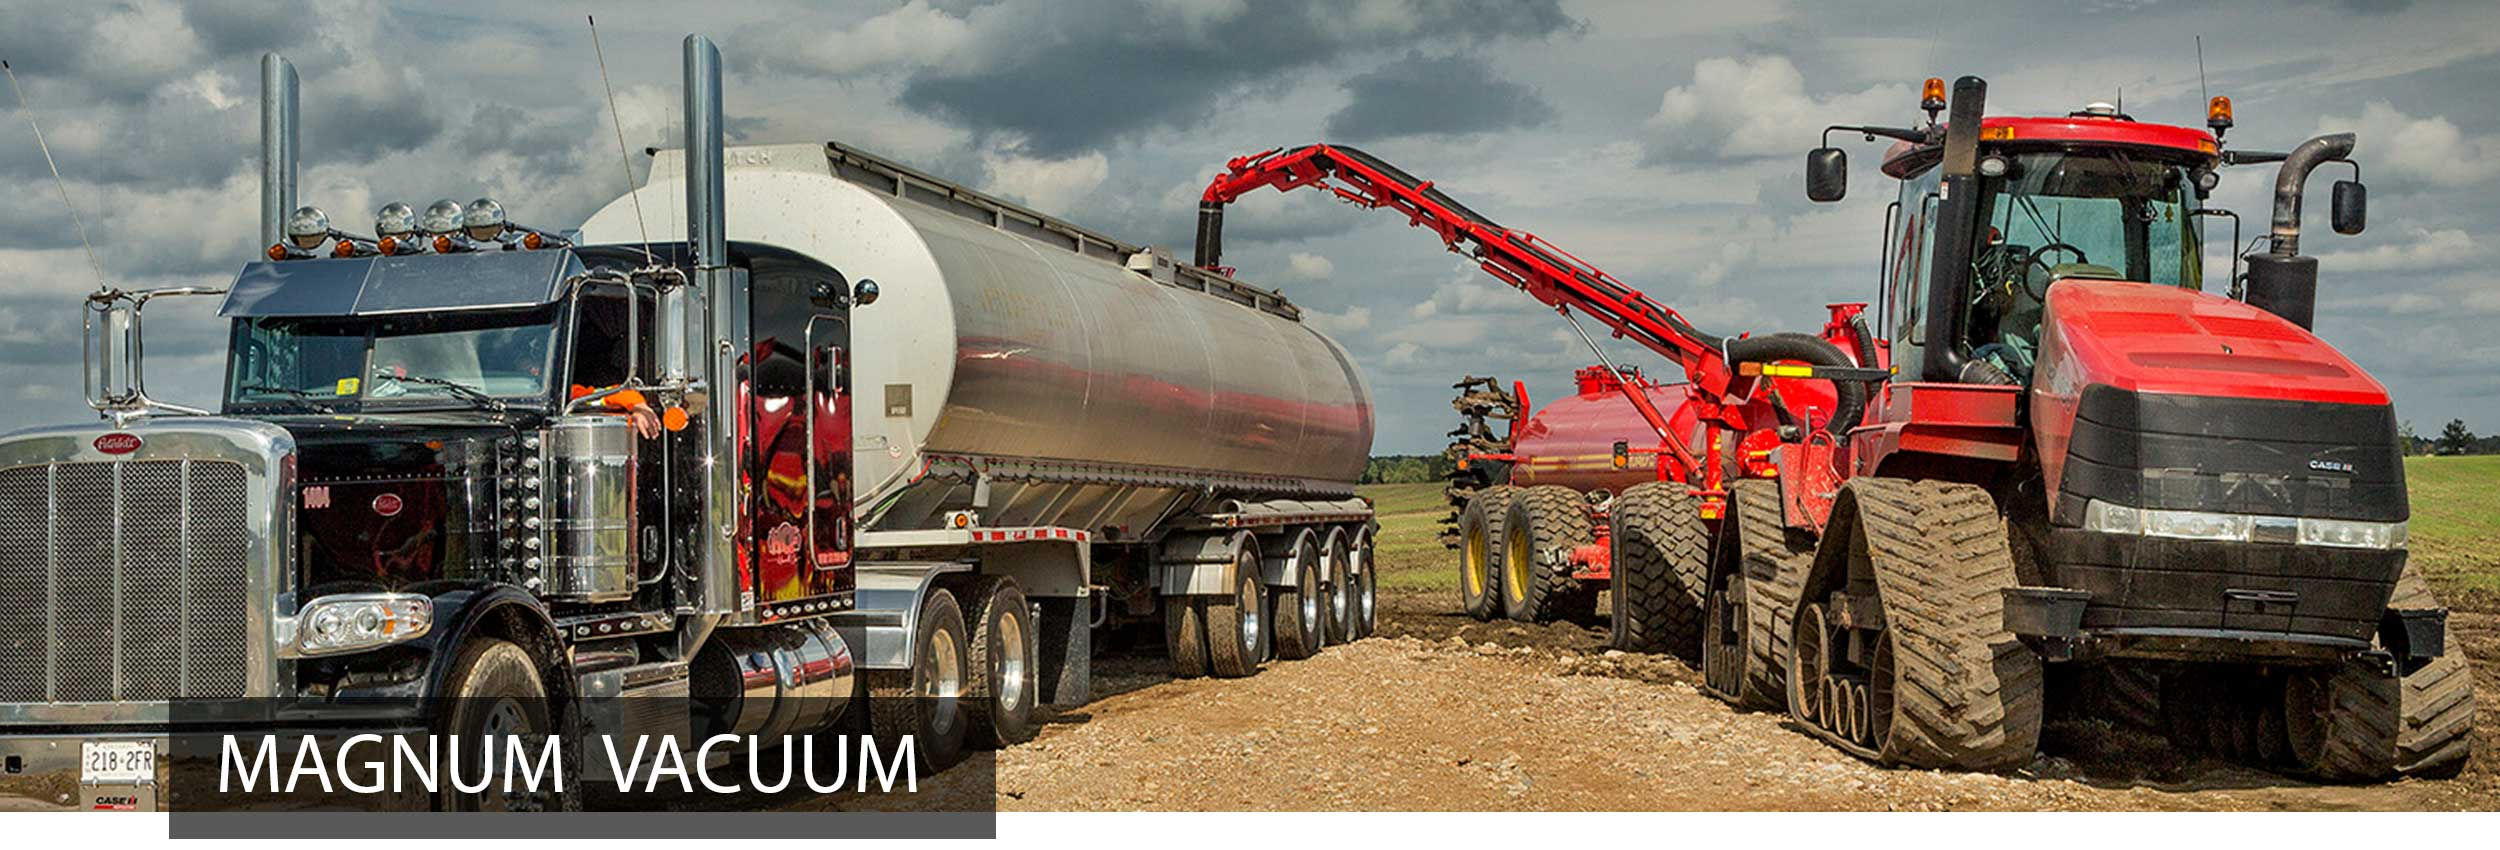 Magnum Manure Tank Unloading